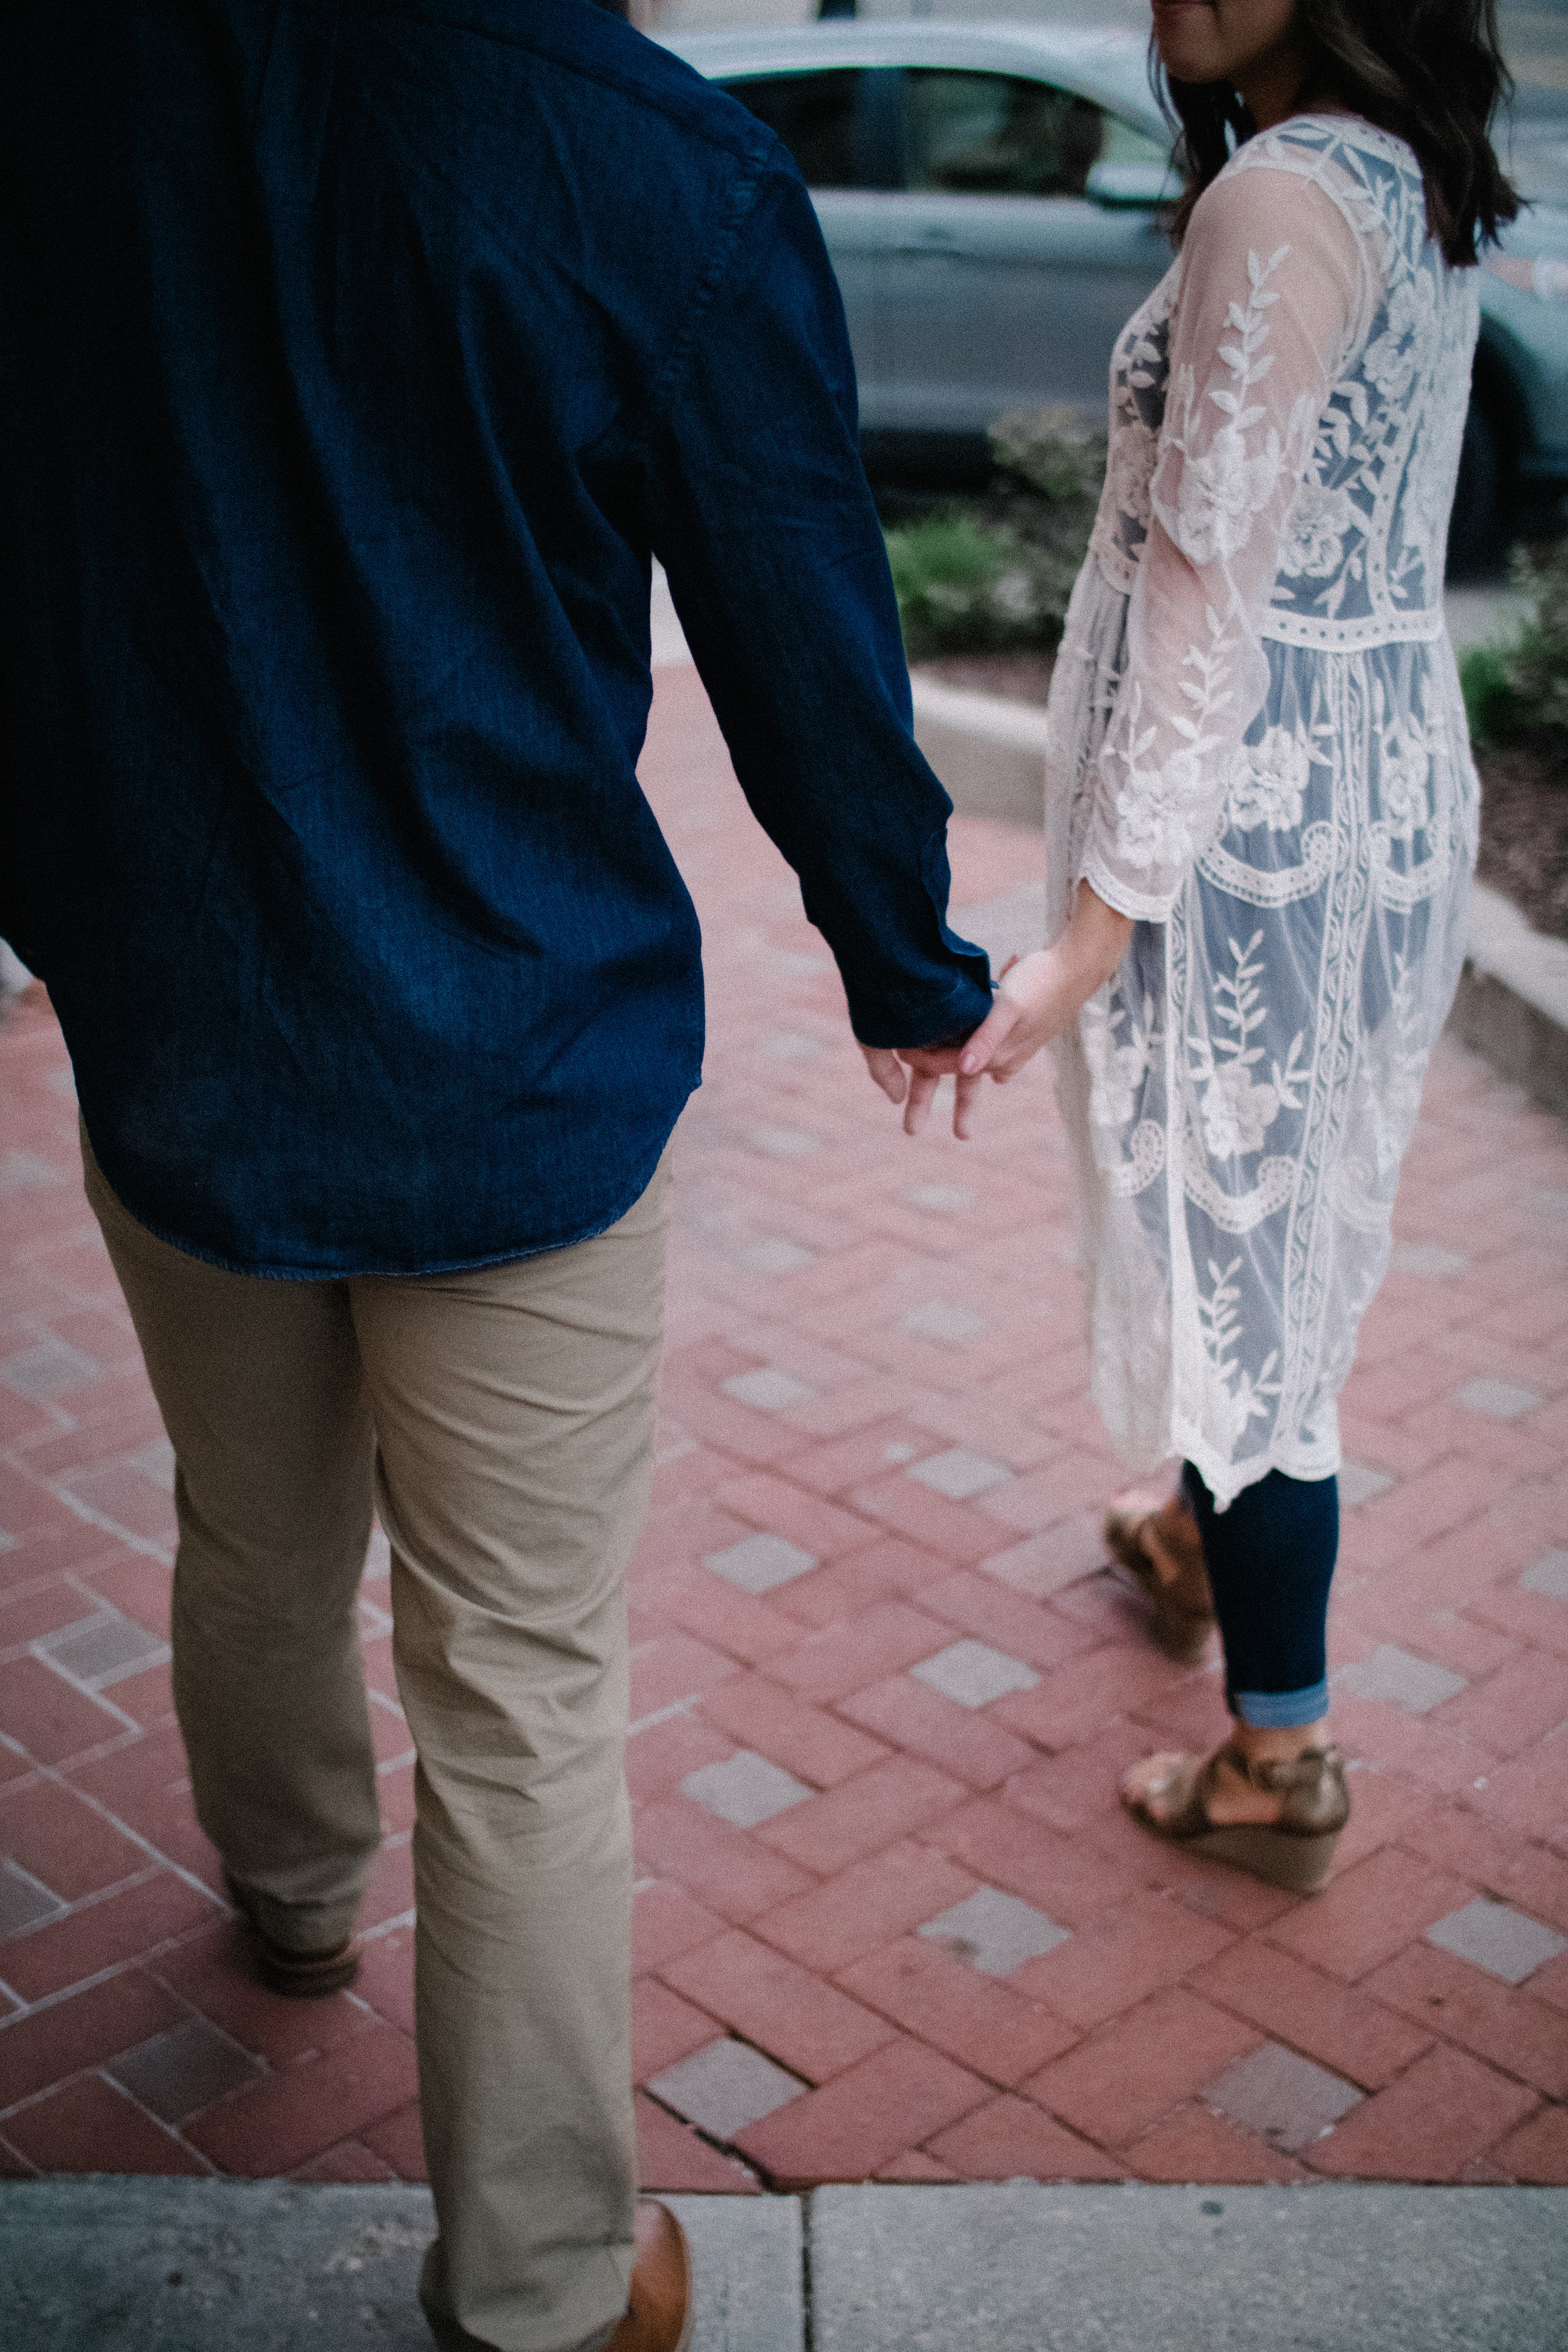 Lauren_Nick_Manzer_Bailey_Engagement_Photos_0190.jpg